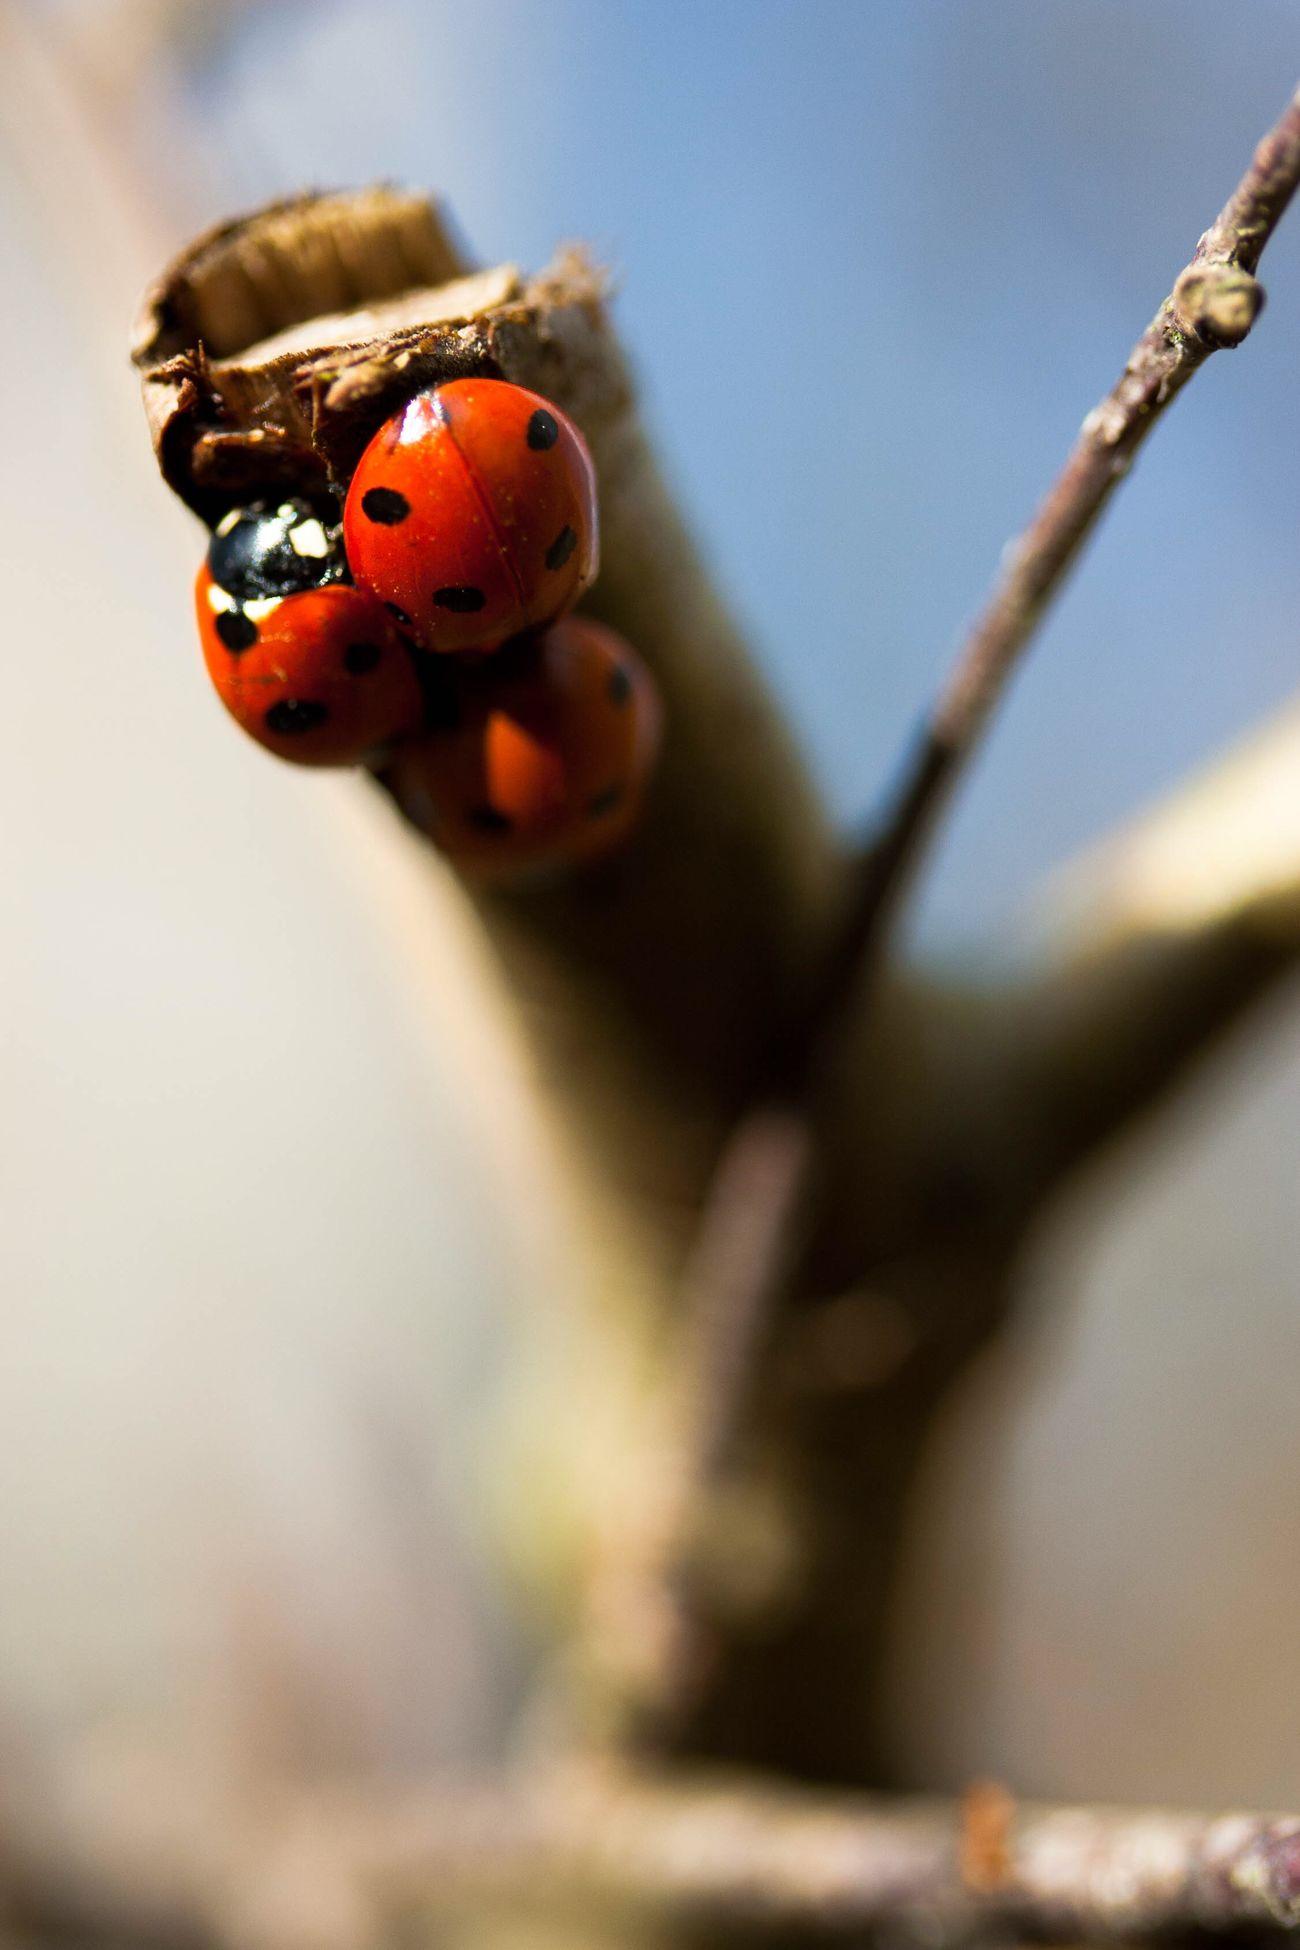 Ladybug Ladybird Insect Nature Wildlife Macro Red